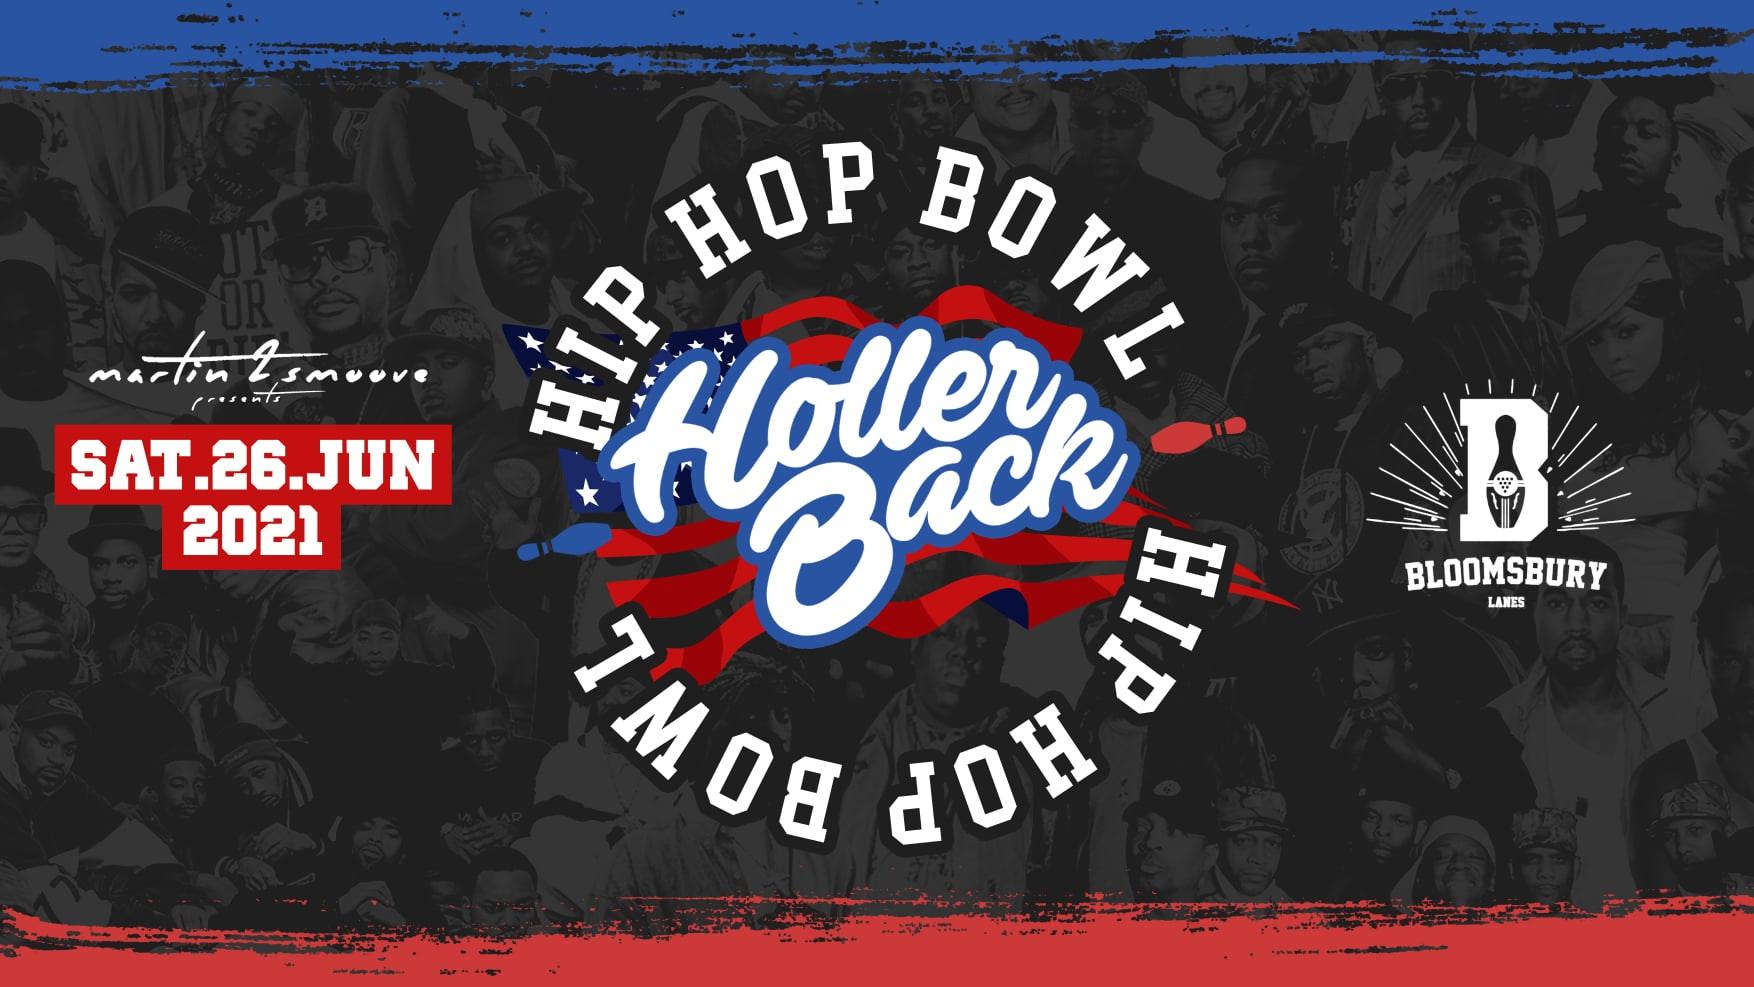 Holler Back Presents: Hip Hop Bowl 🎳 – Bloomsbury Lanes Saturday 26th June